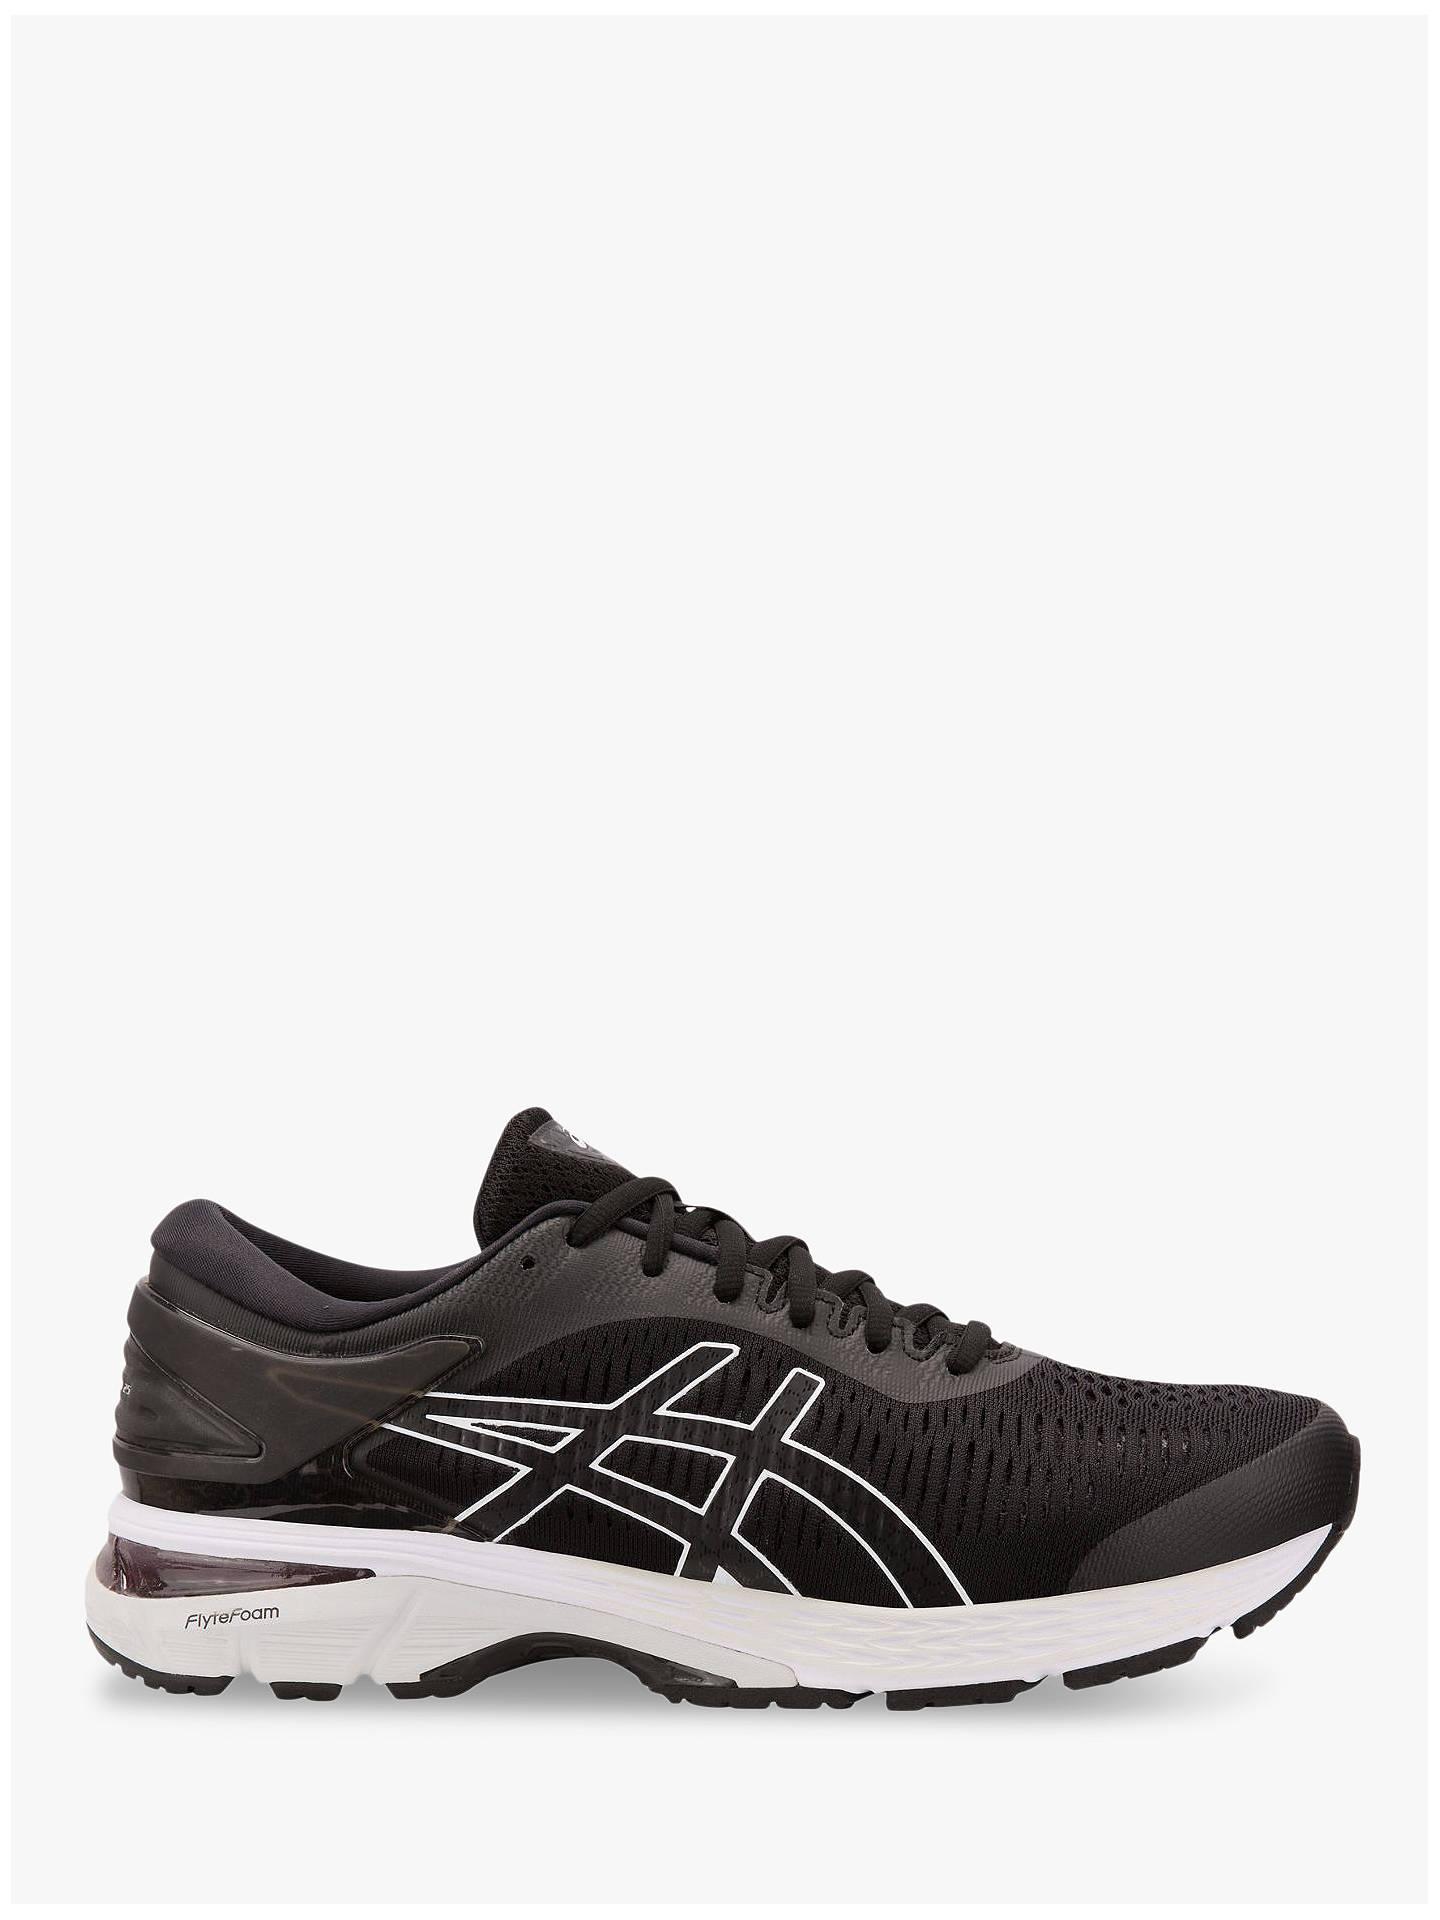 e8880fcc76e5 ASICS GEL-KAYANO 25 Men s Running Shoes at John Lewis   Partners